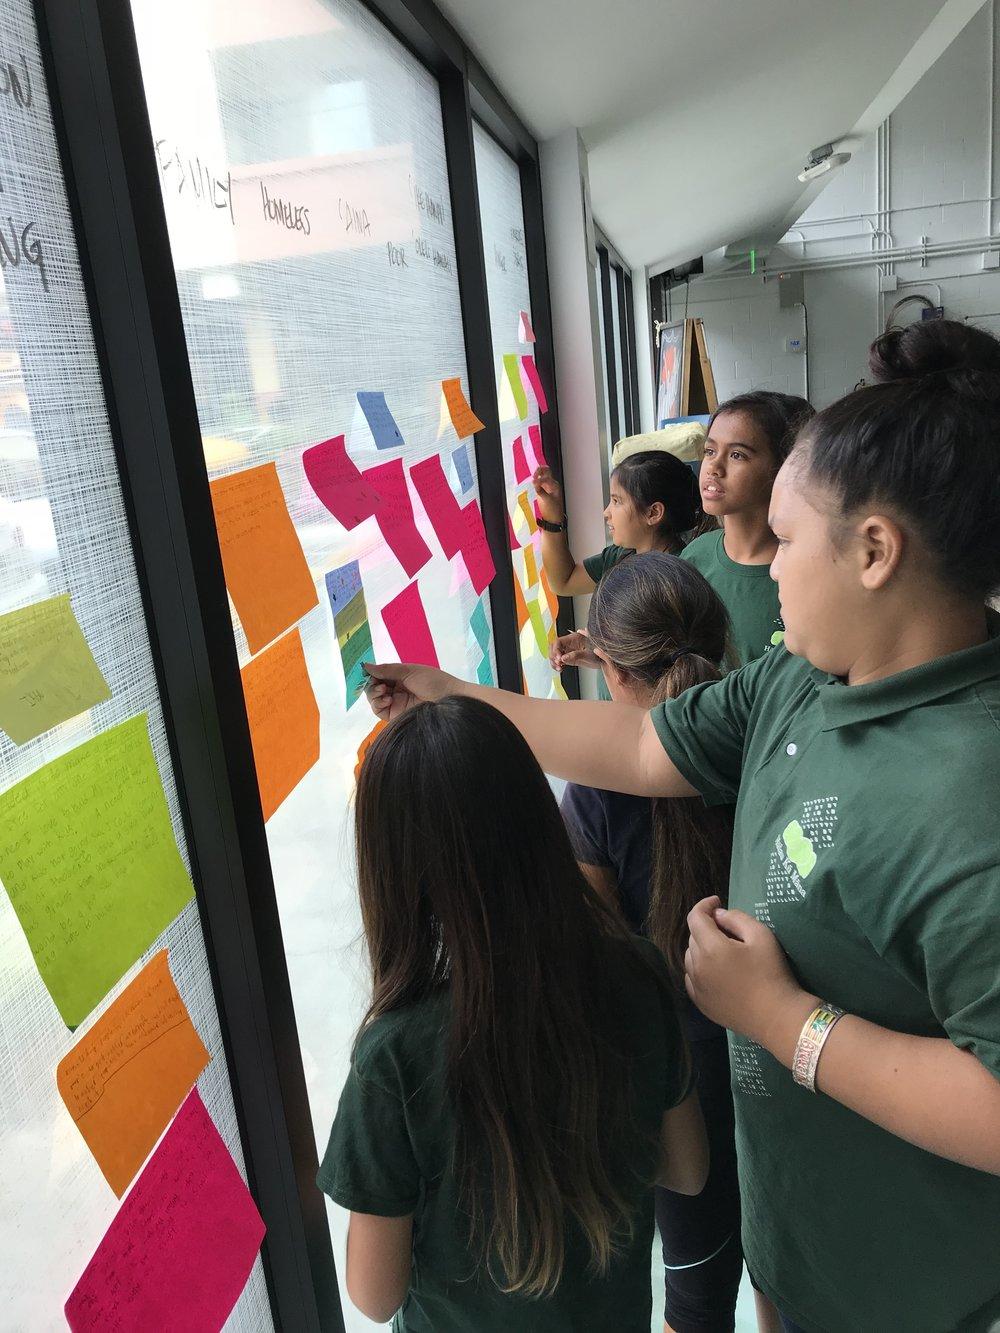 Hālau Kū Māna students working on growing their ideas collaboratively at Hālau ʻĪnana.